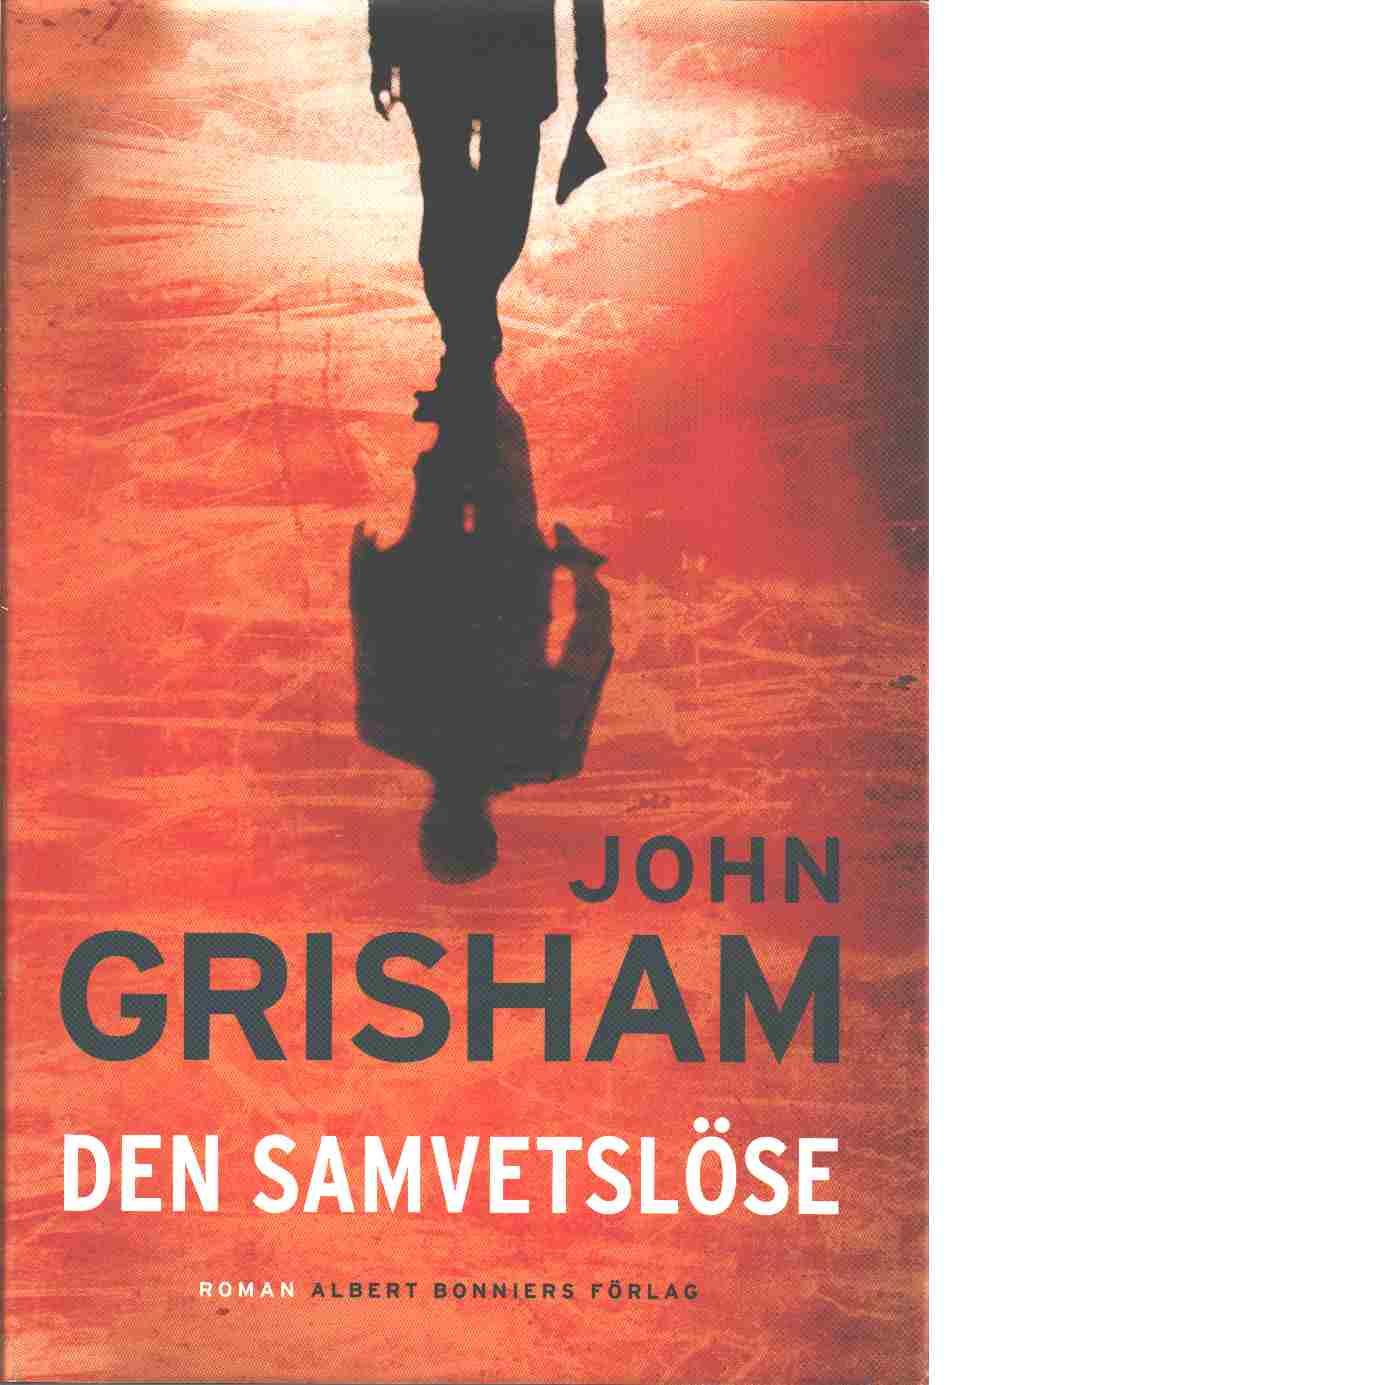 Den samvetslöse - Grisham, John